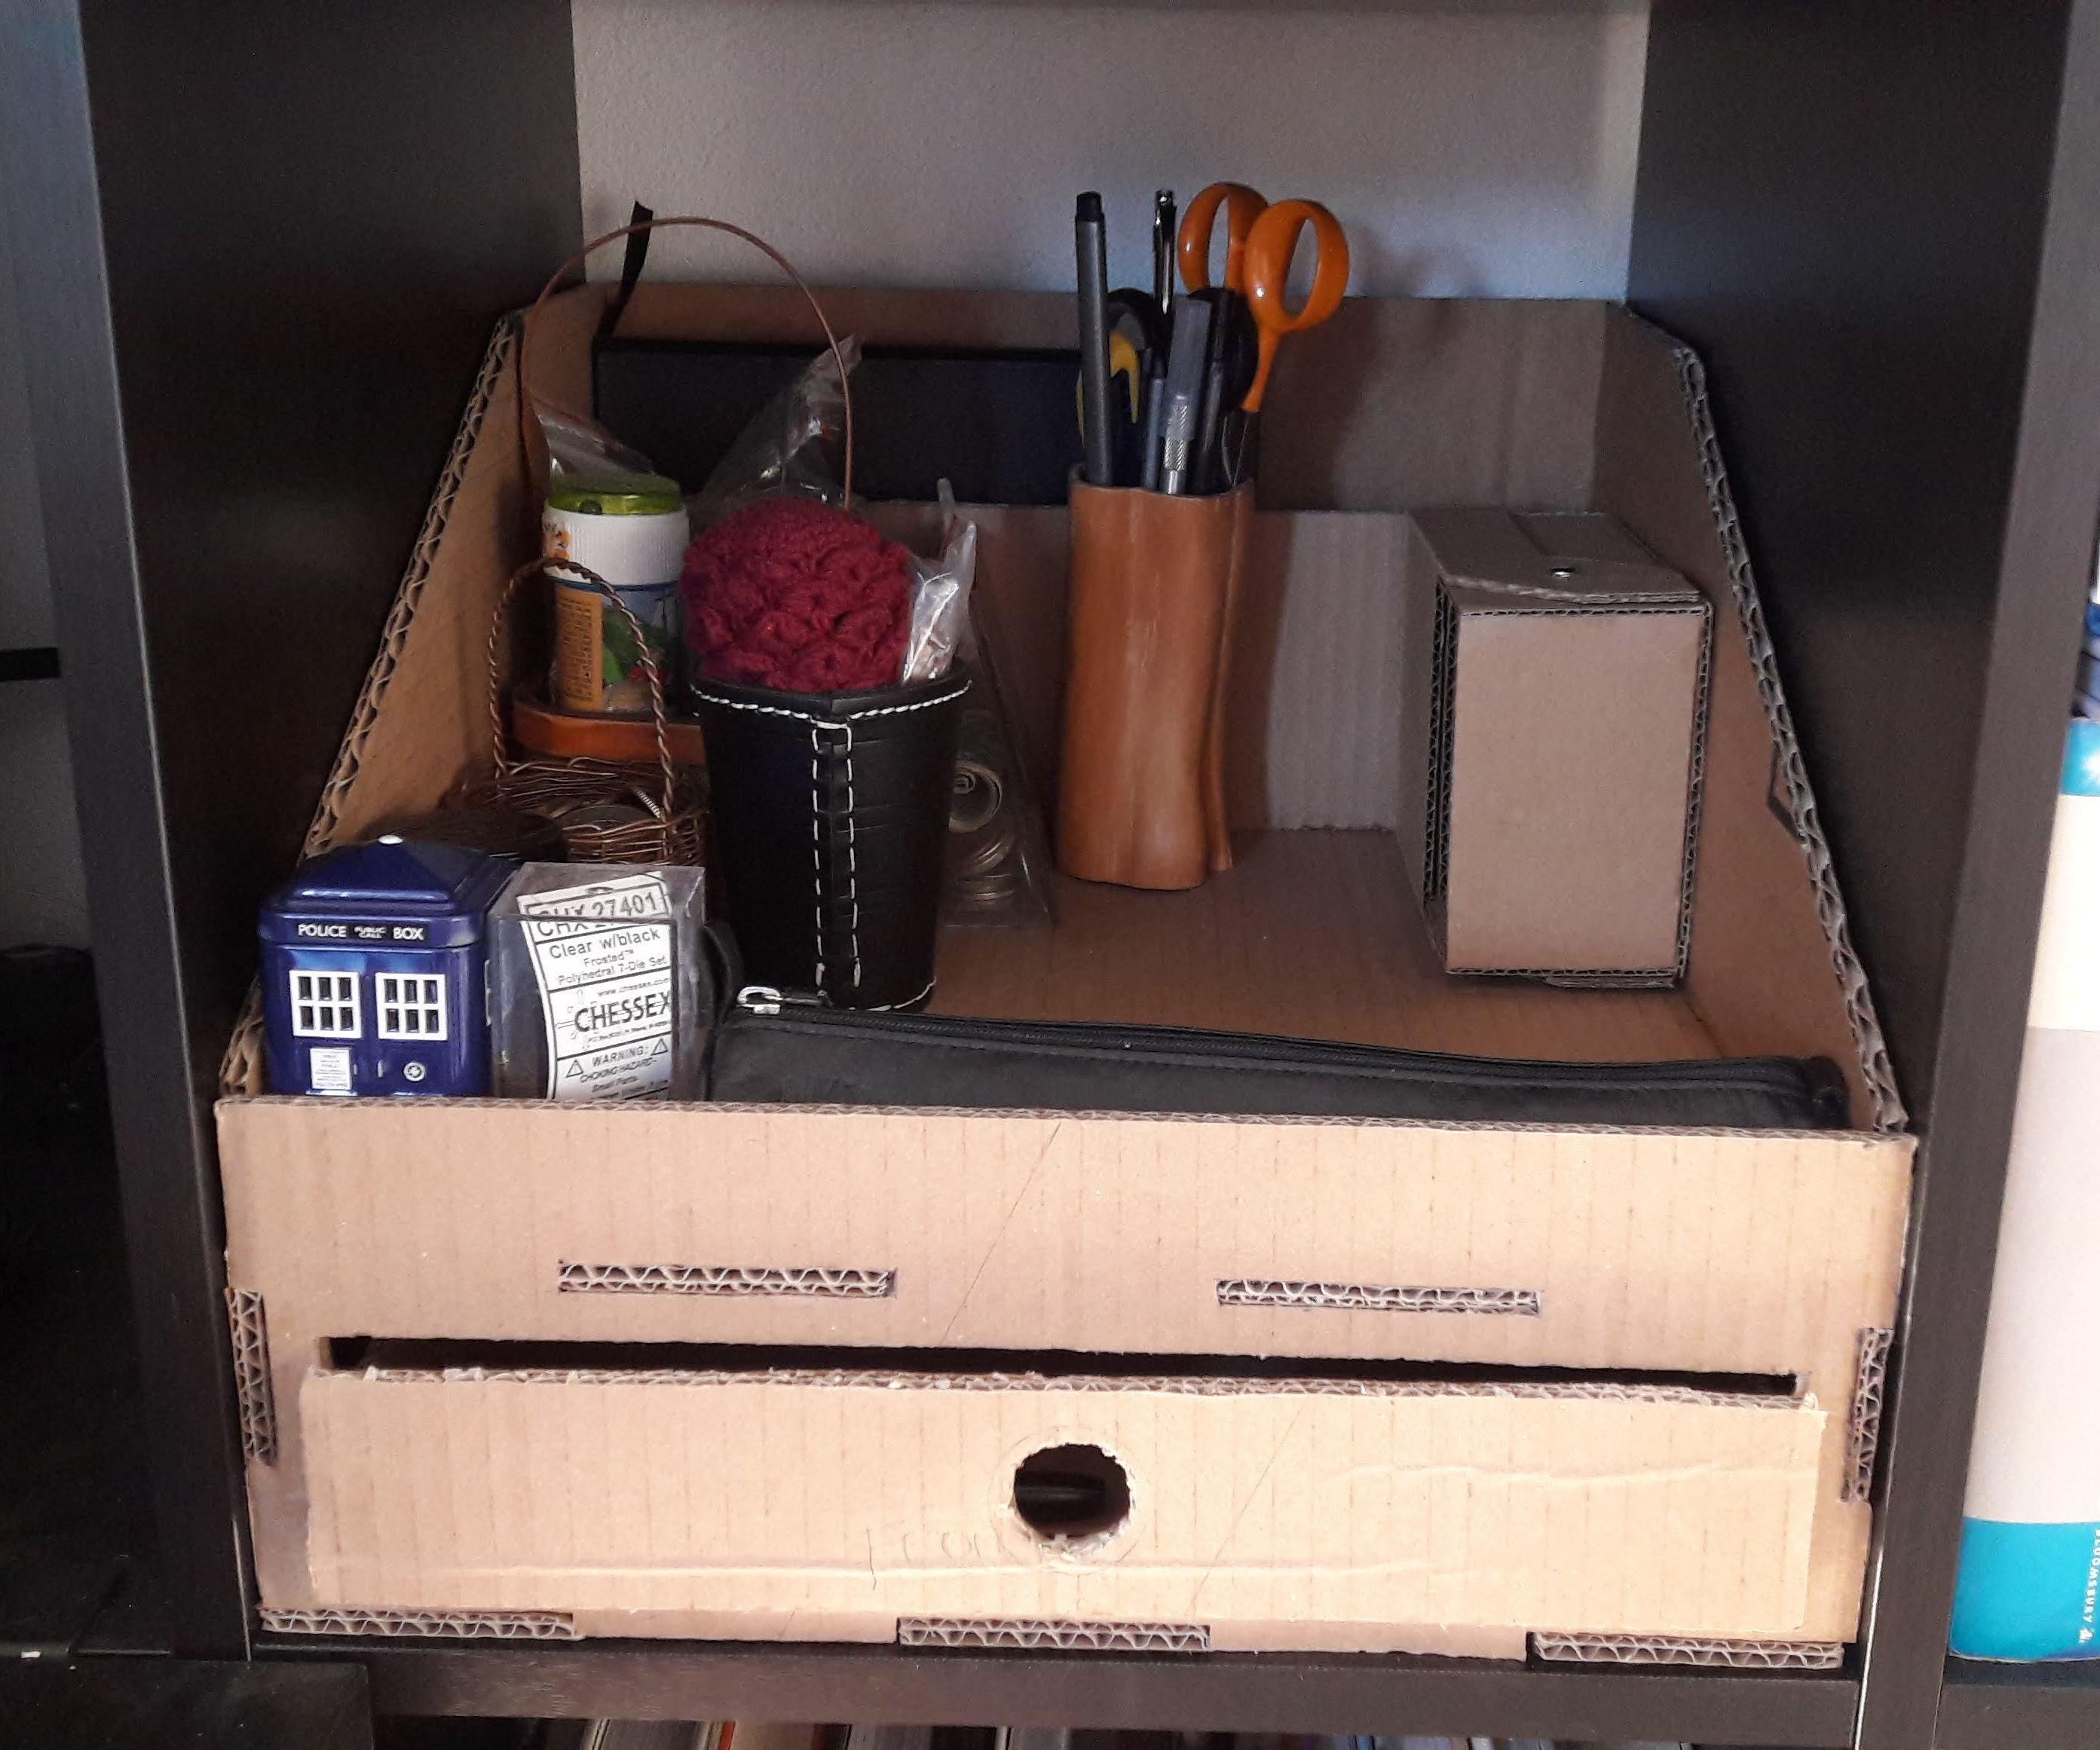 Cardboard Desktop Organizer for IKEA Kallax : 31 Steps - Instructables